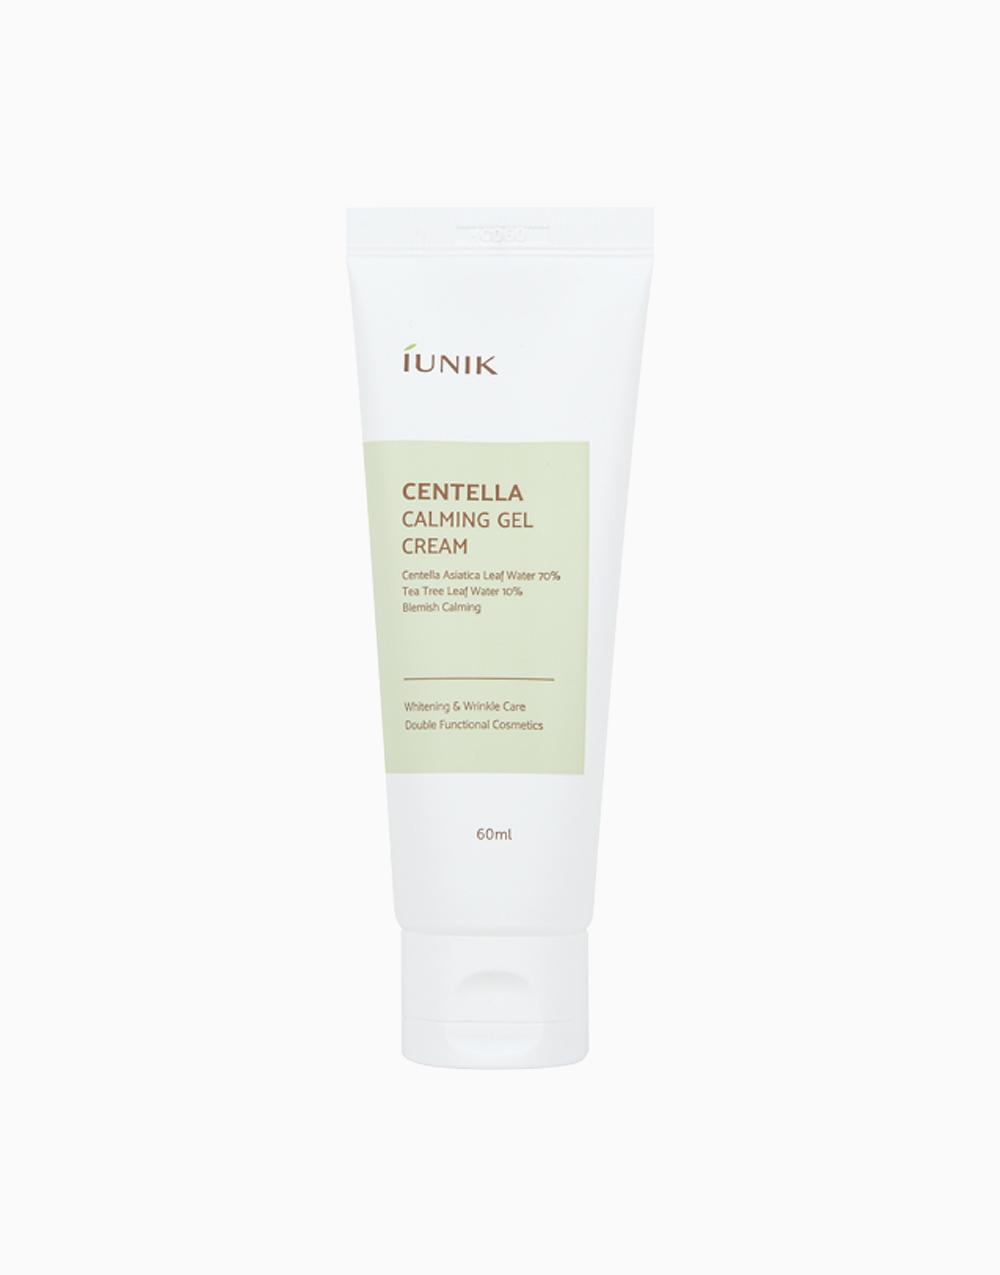 Centella Calming Gel Cream by iUnik